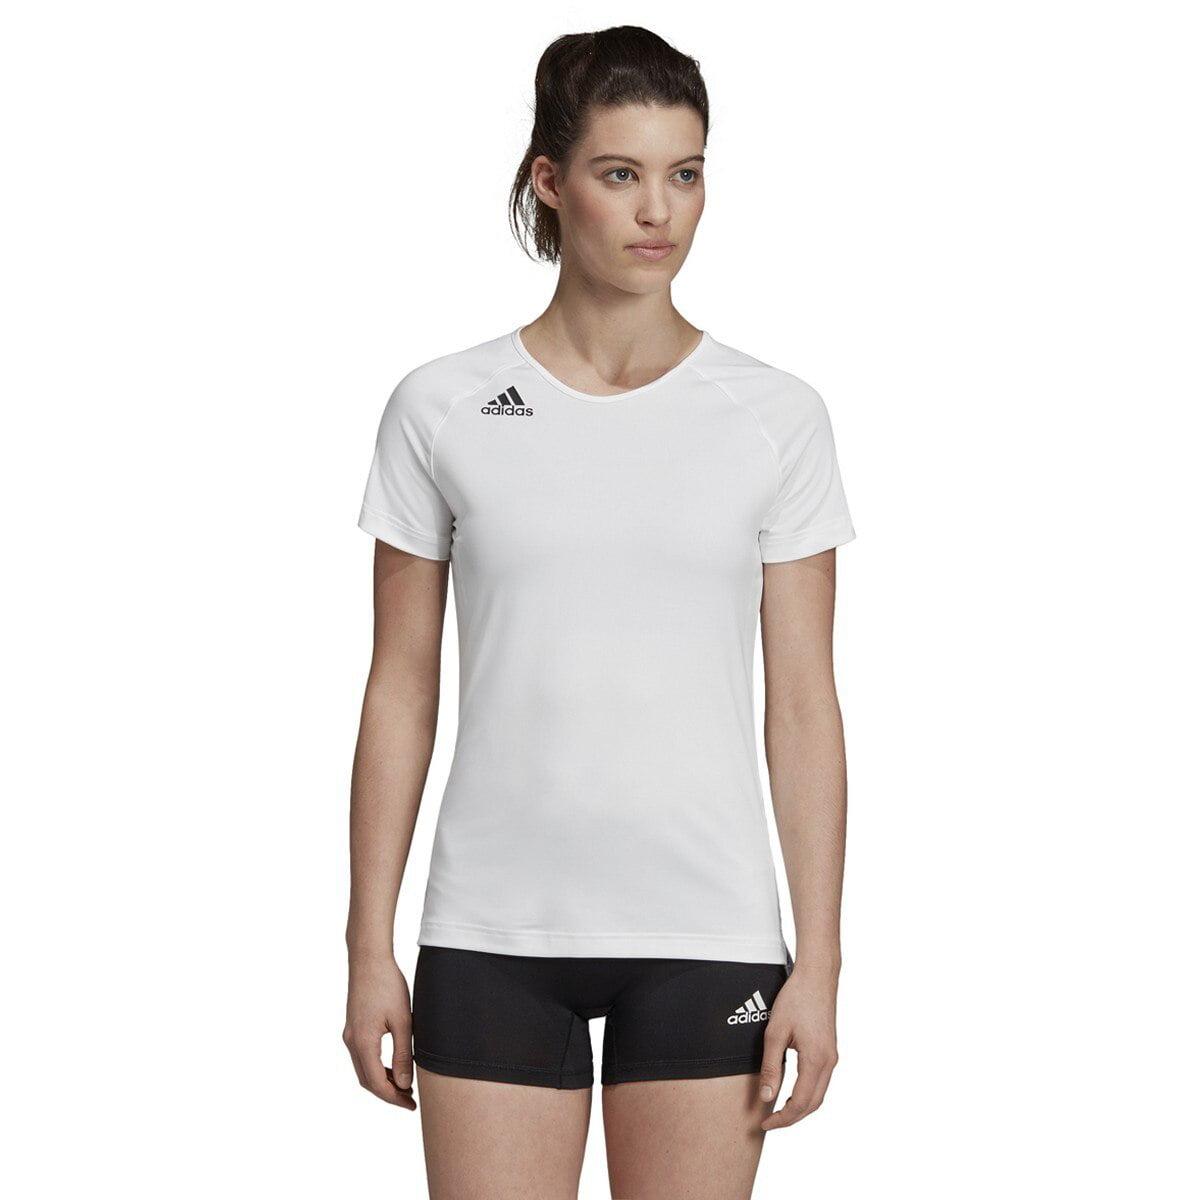 Adidas HILO Women's Short Sleeve Volleyball Jersey DP4343 - White, Black